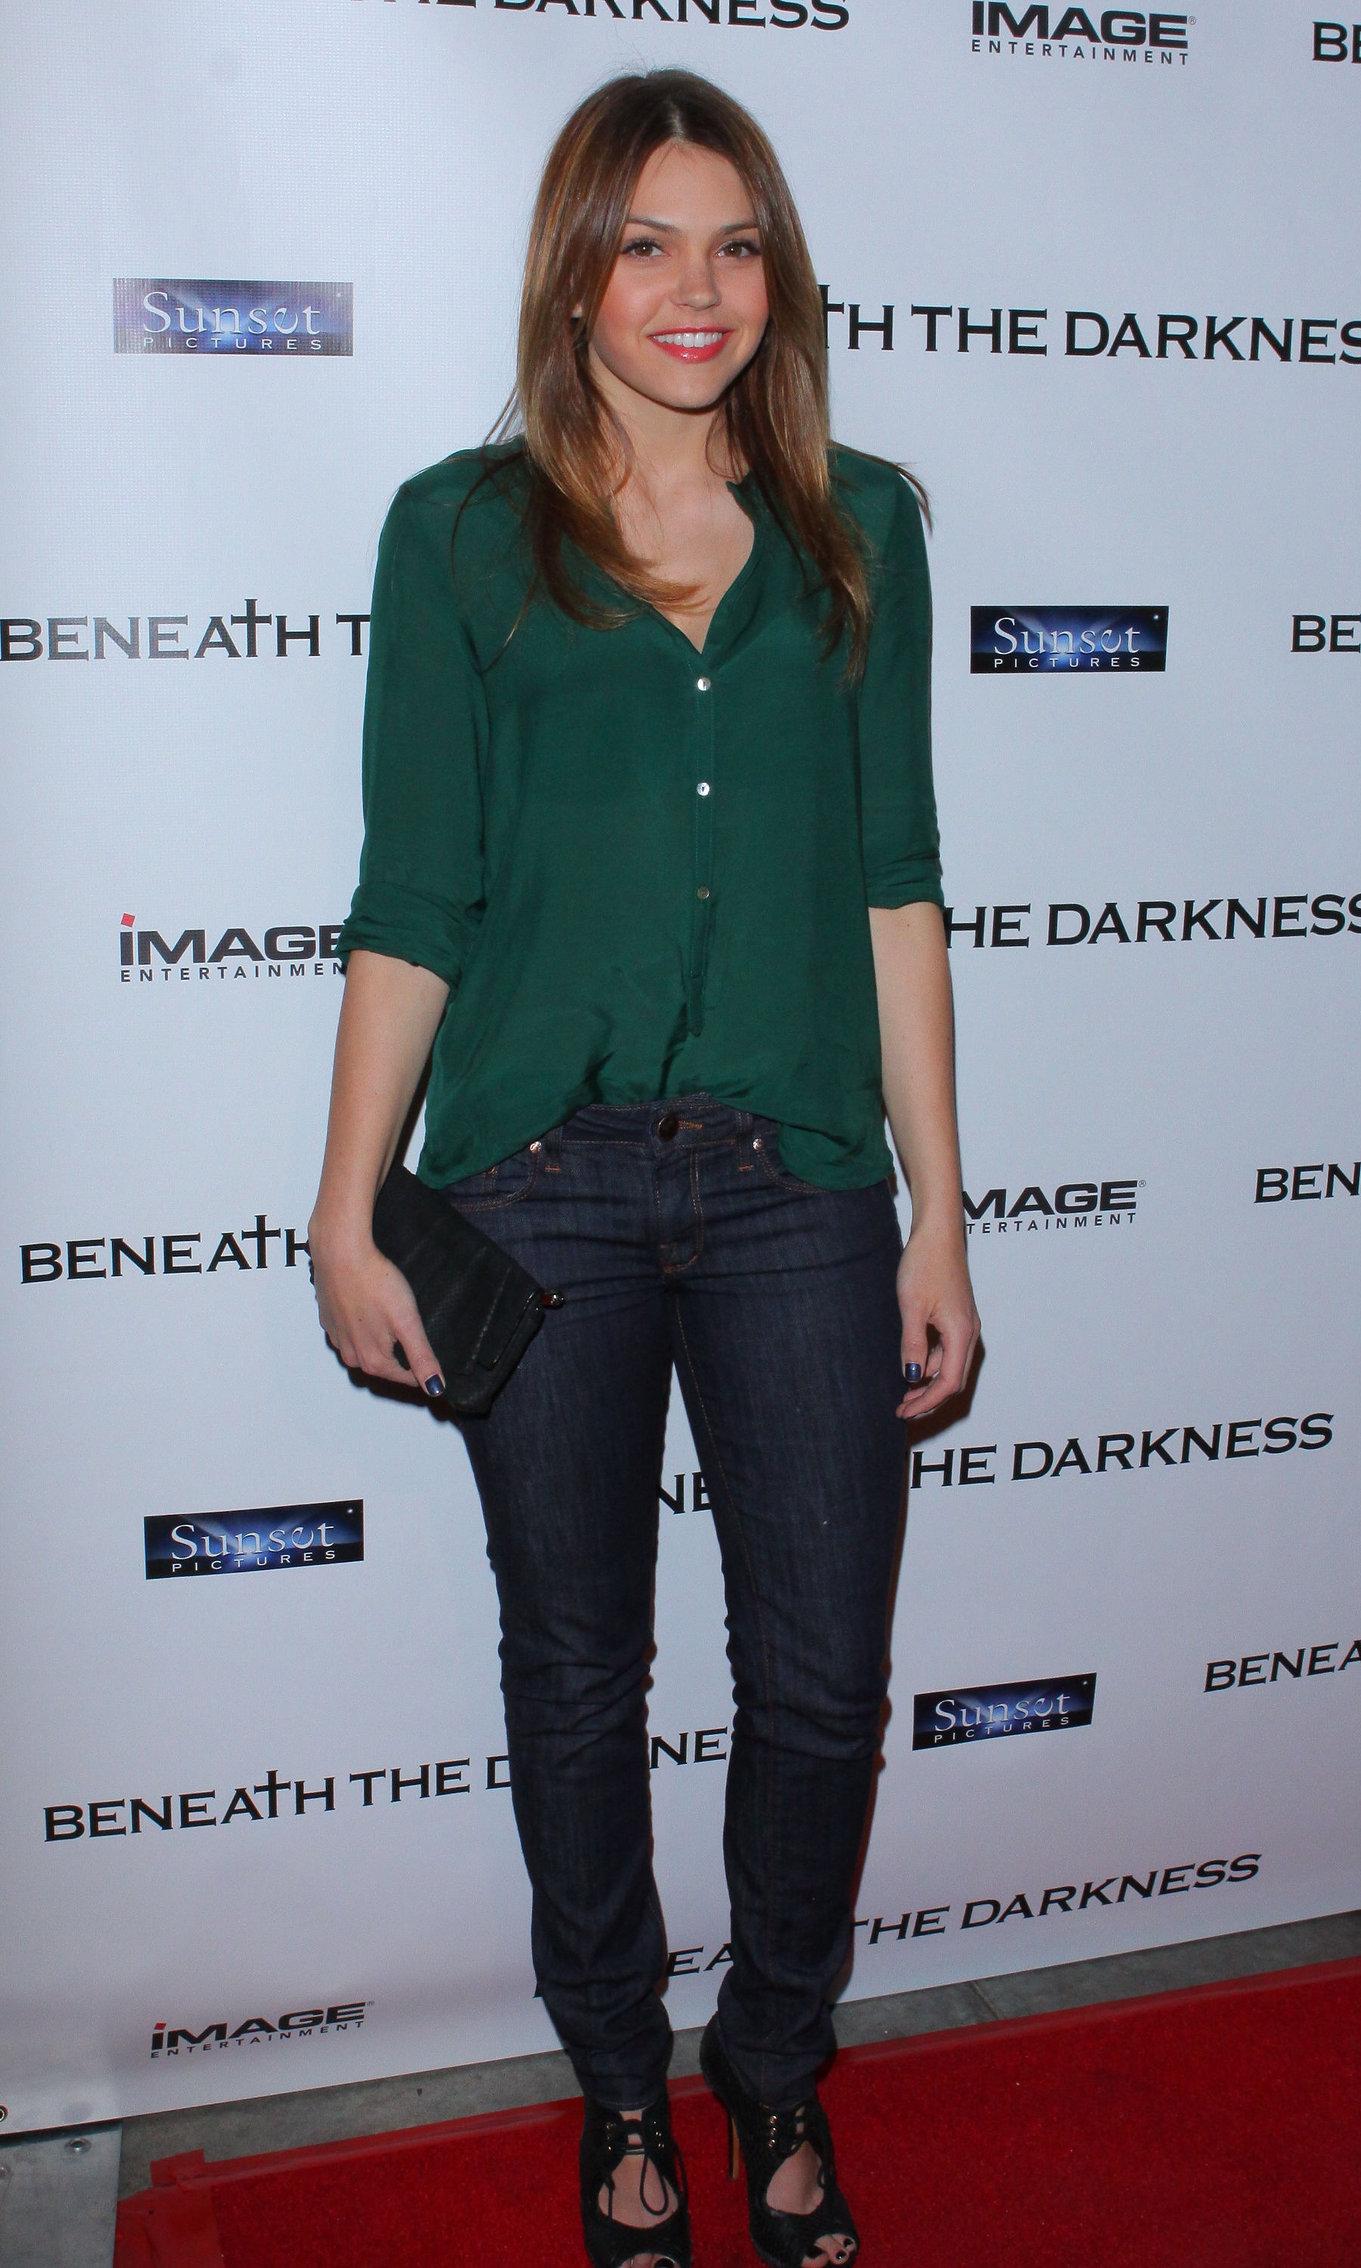 Aimee Teegarden screening of Beneath the Darkness in Los Angeles on January 4, 2011